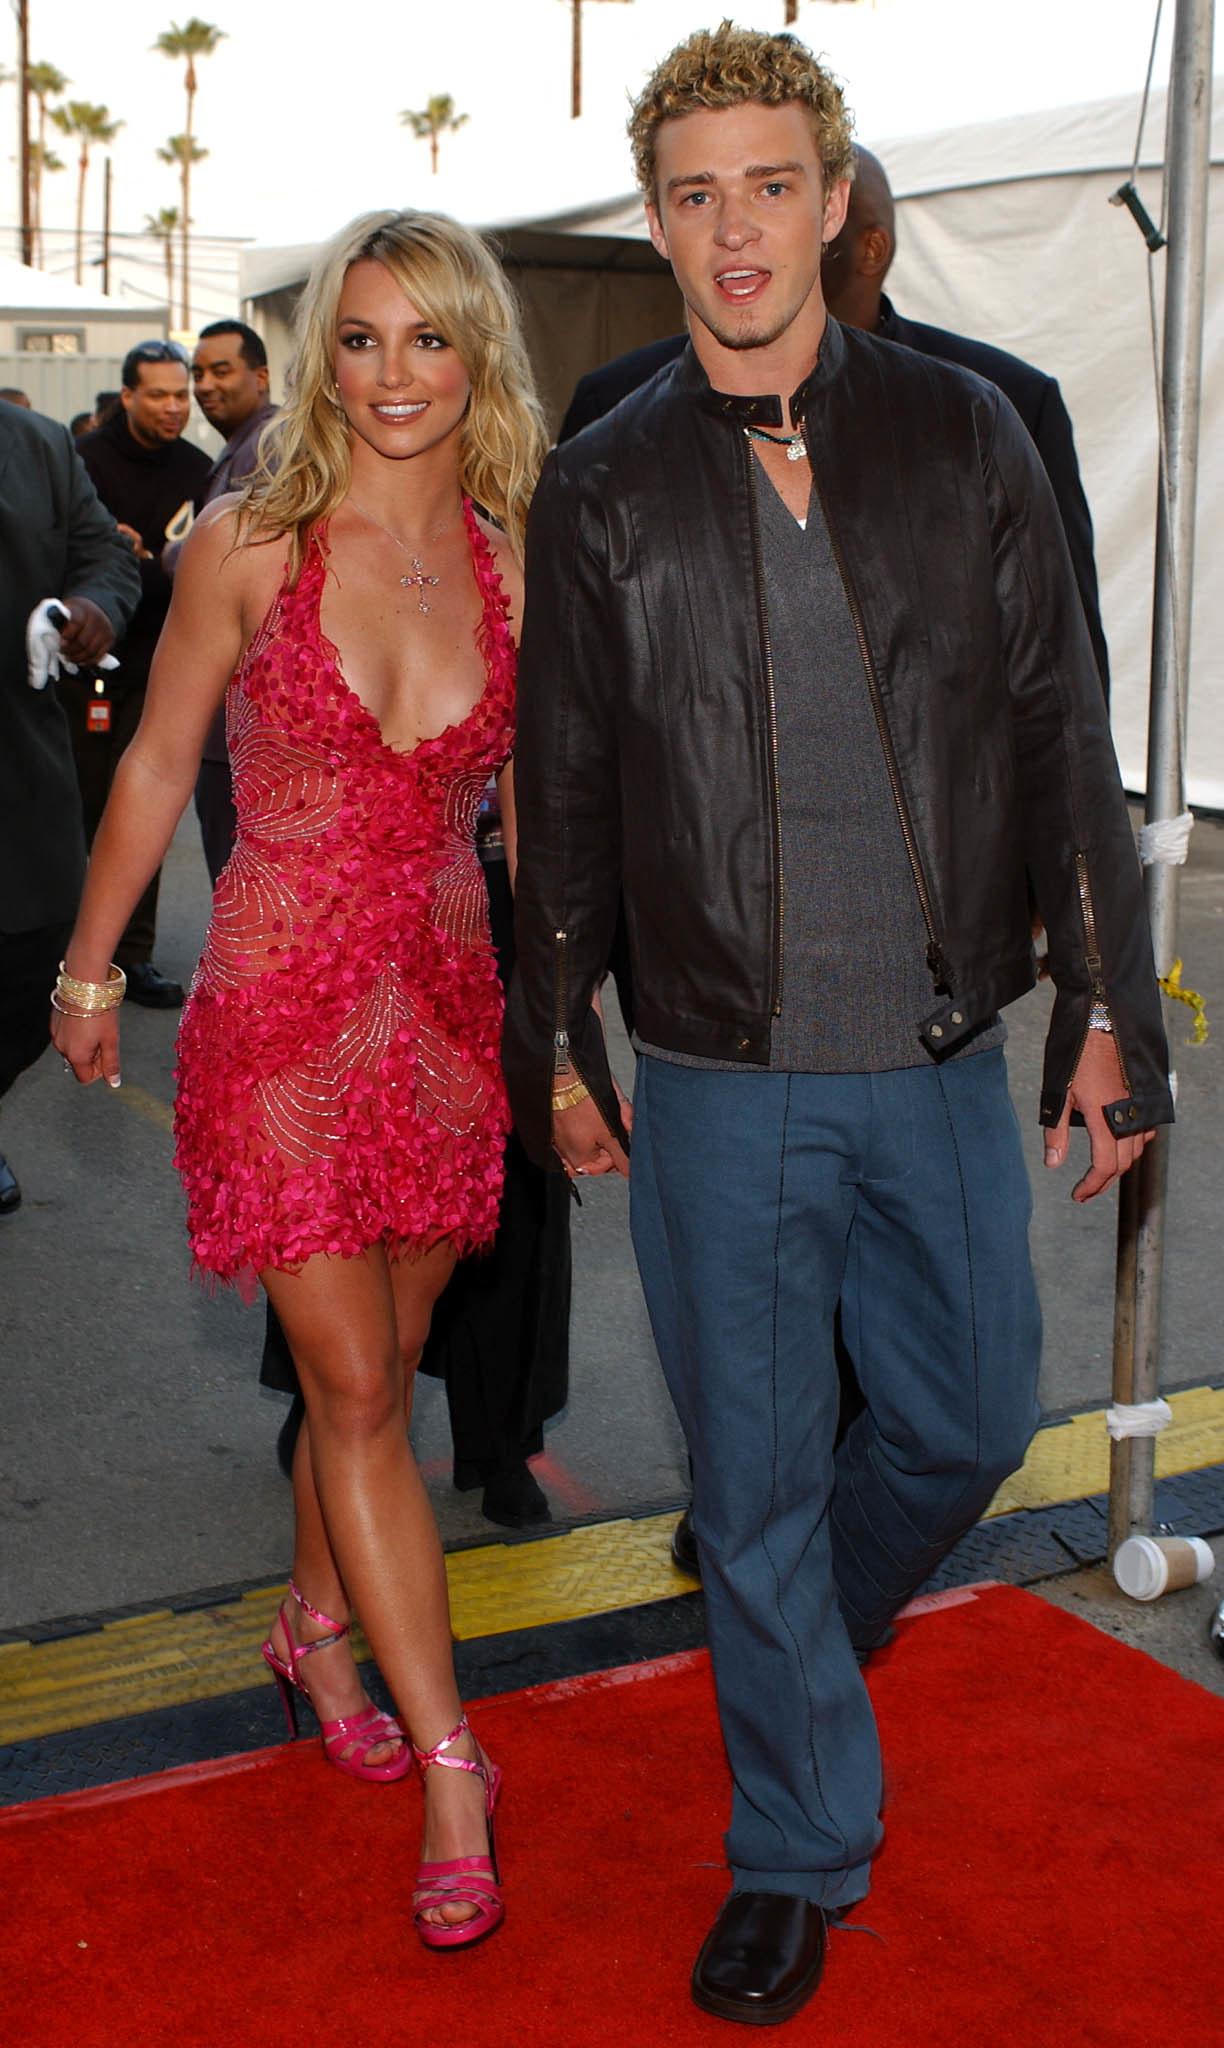 Britney Spears andJustin Timberlake